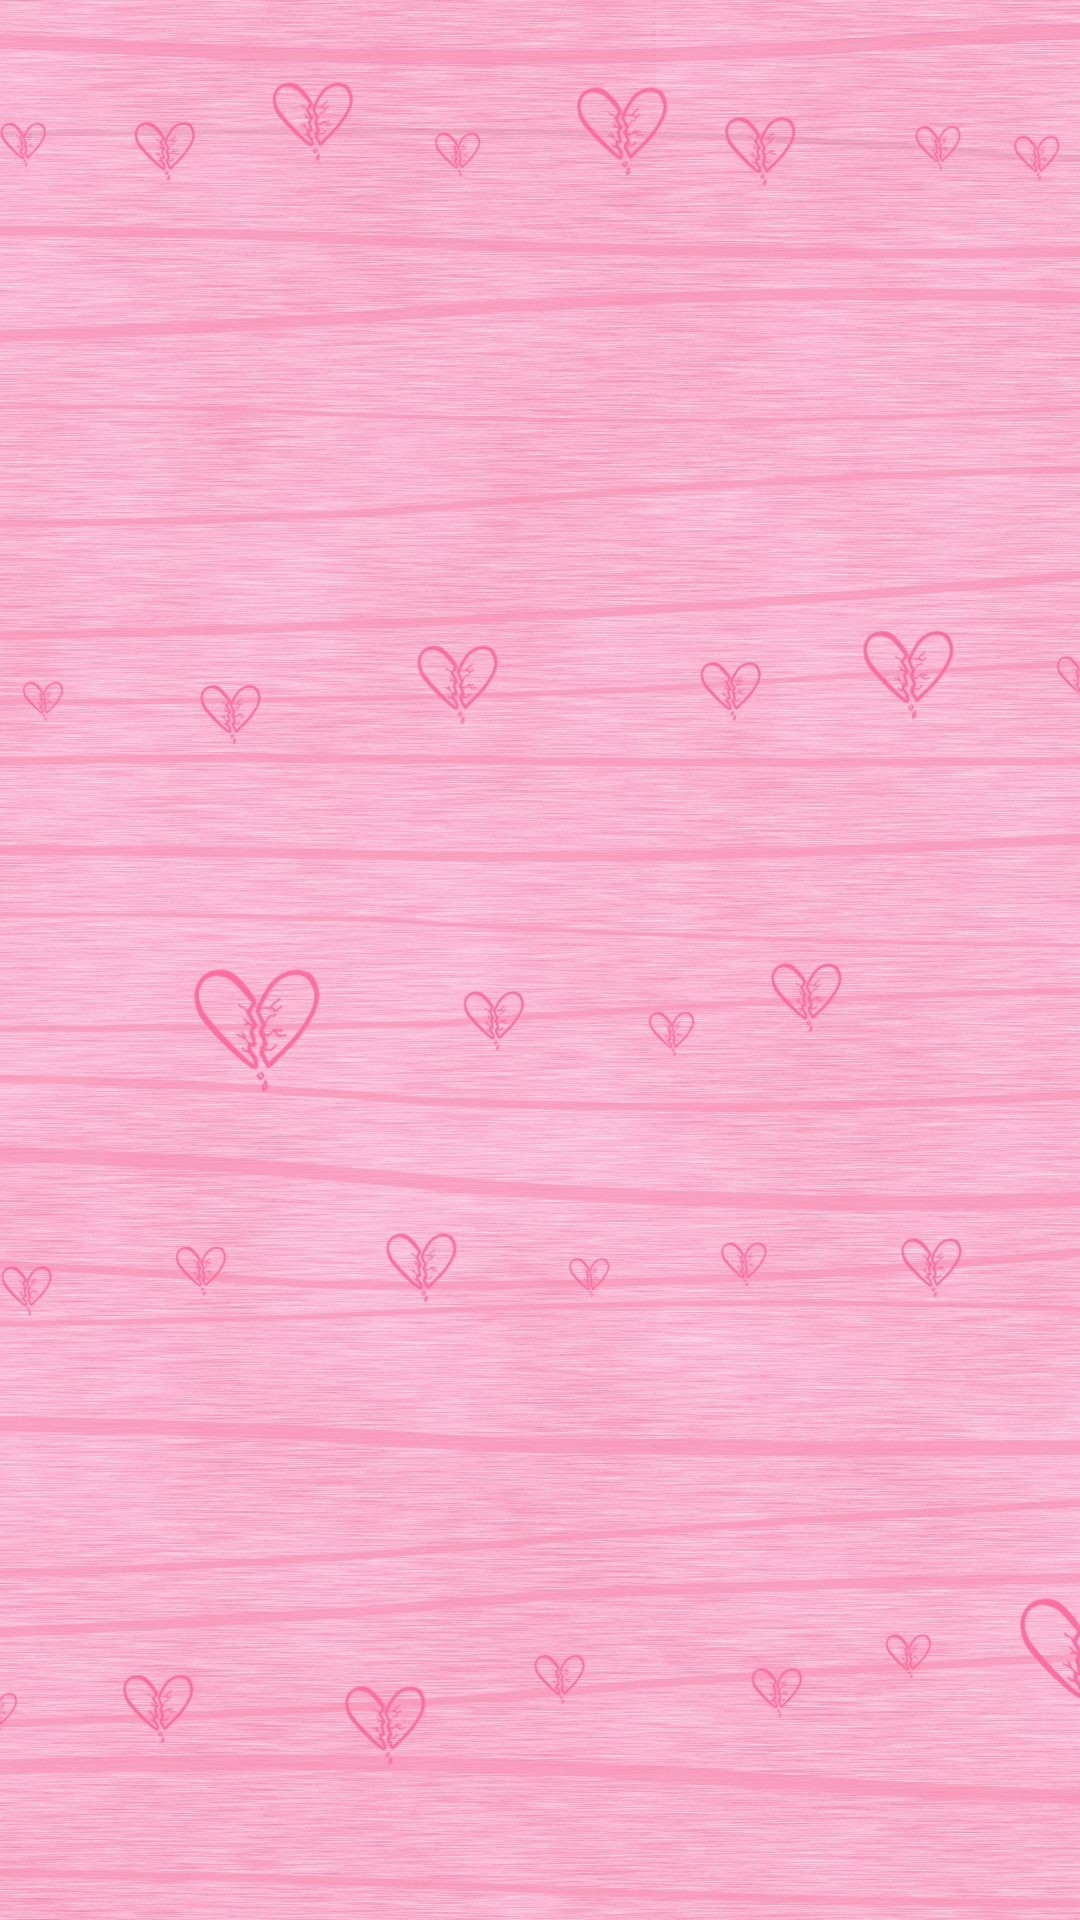 Res: 1080x1920, Pink Heart Wallpaper iphone 6 Plus.jpg 1,080×1,920 pixeles